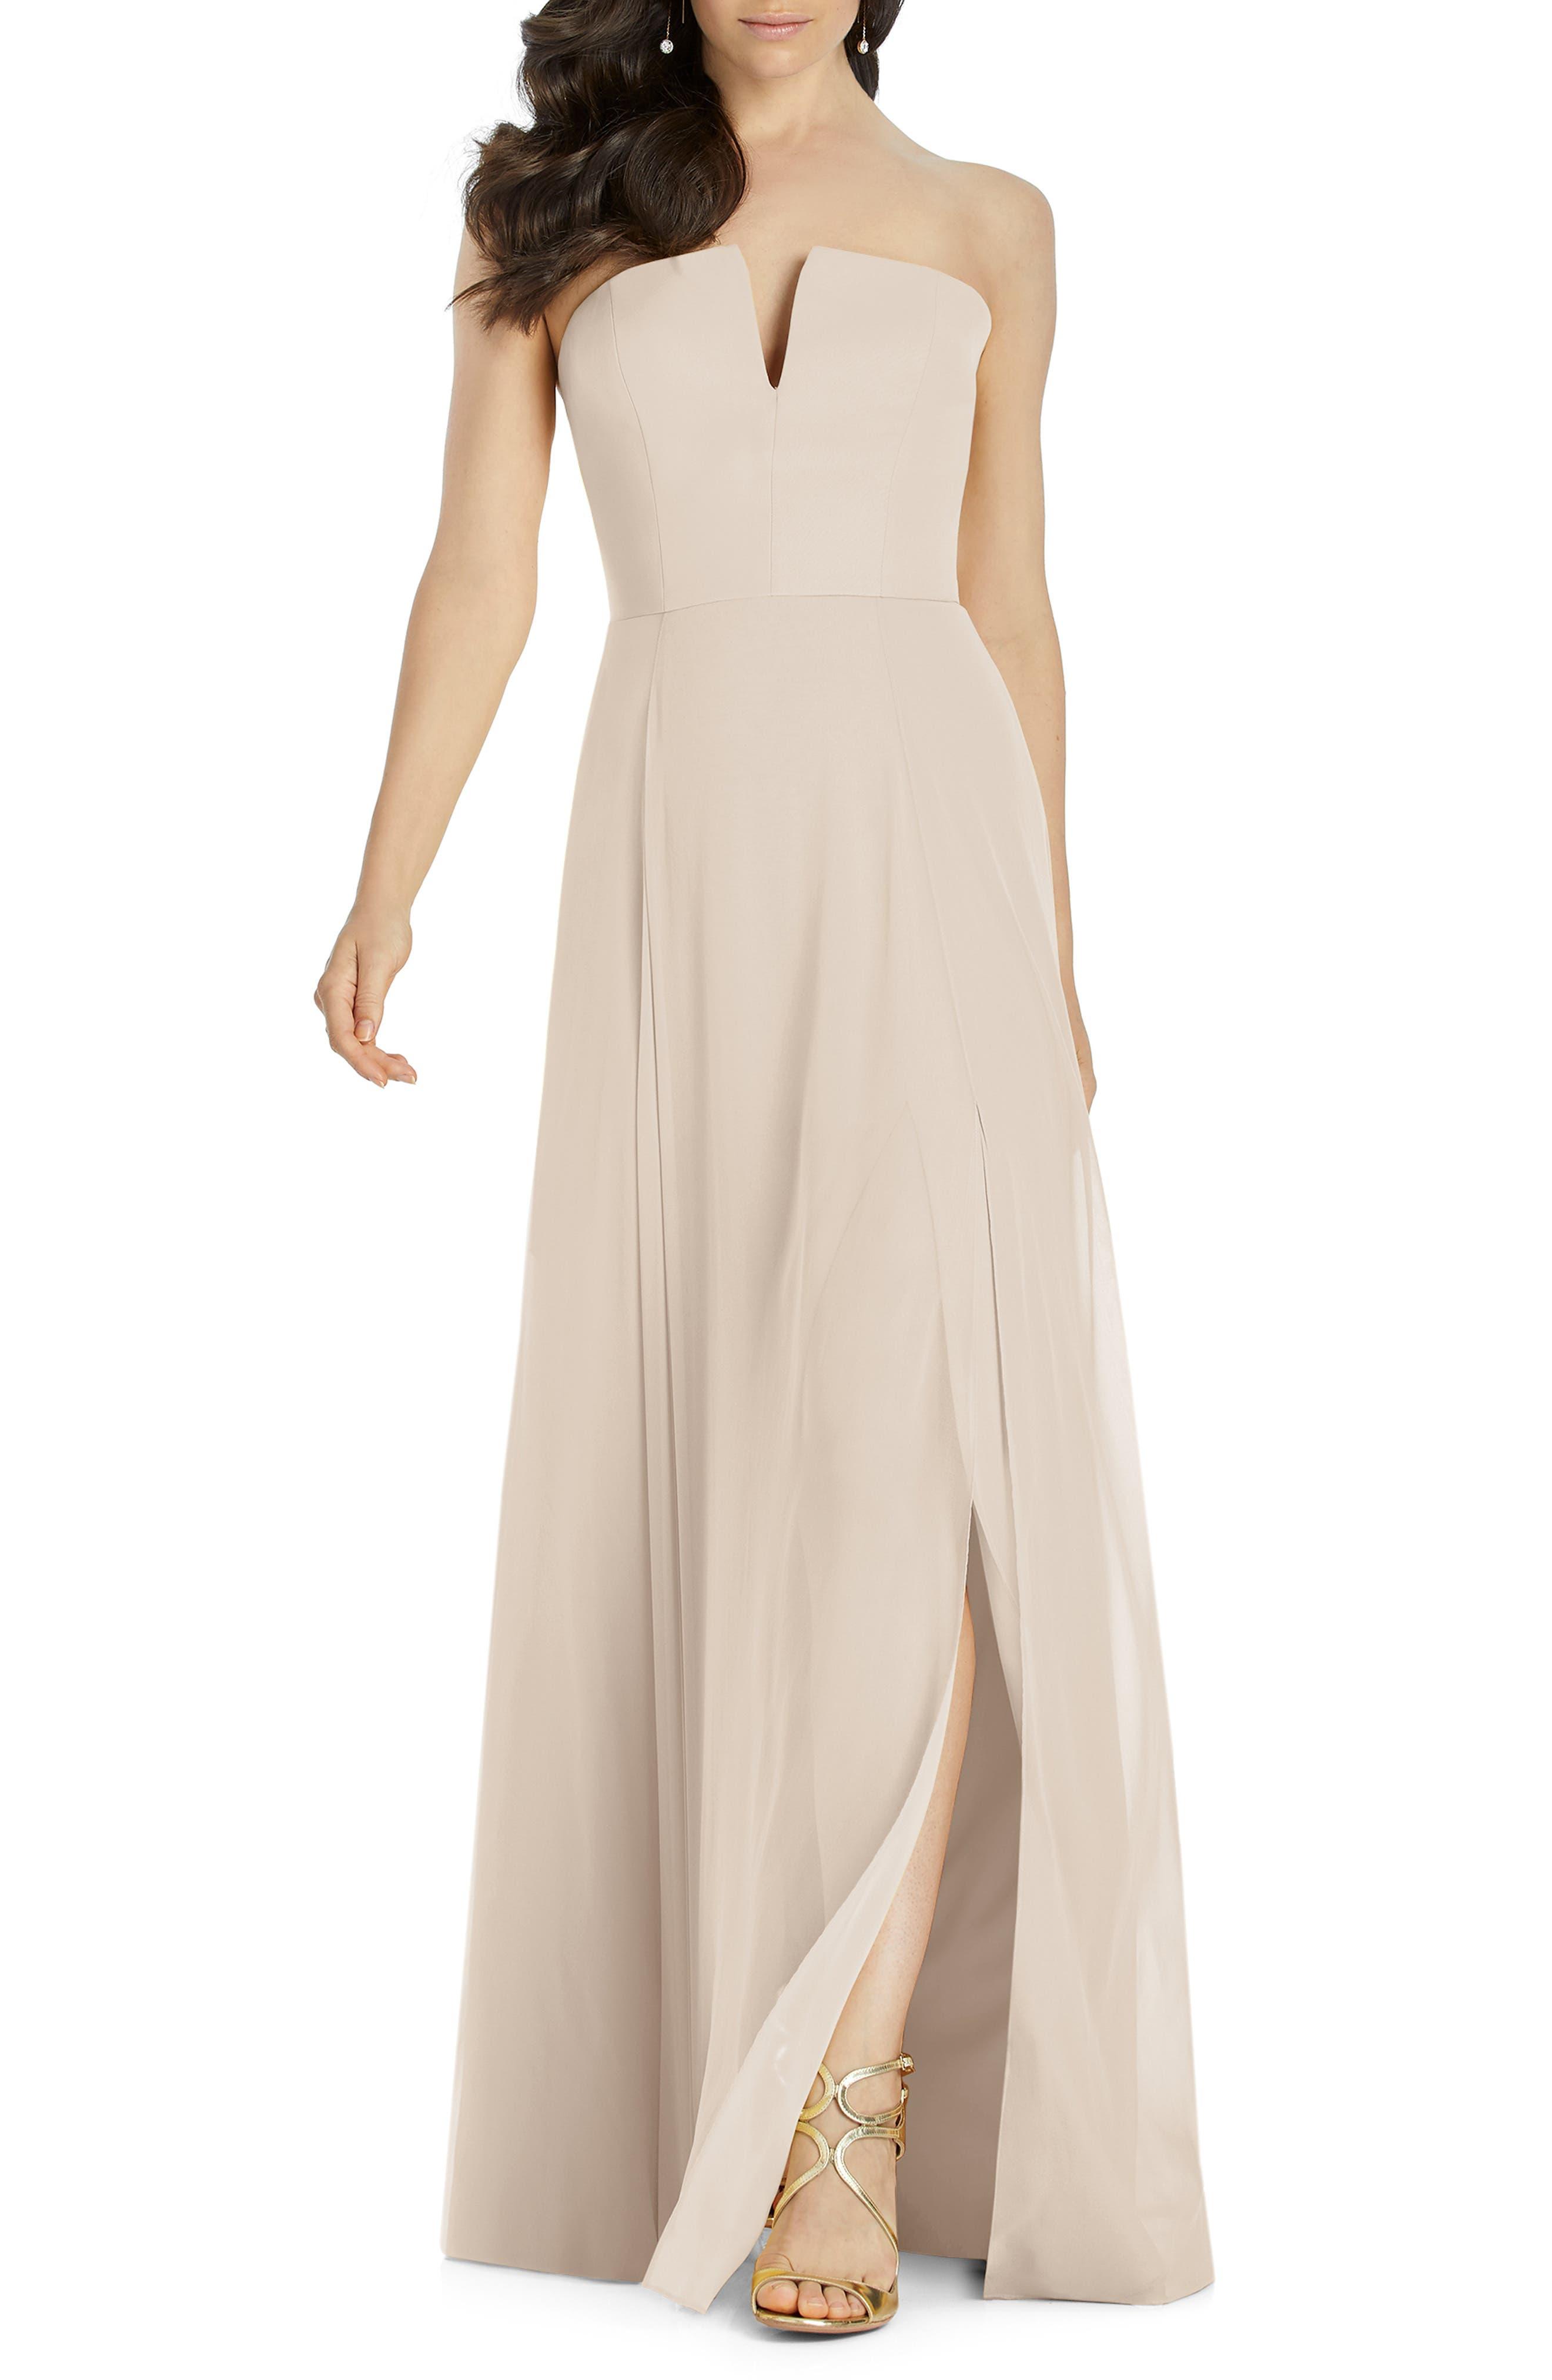 Dessy Collection Strapless Chiffon Evening Dress, Beige